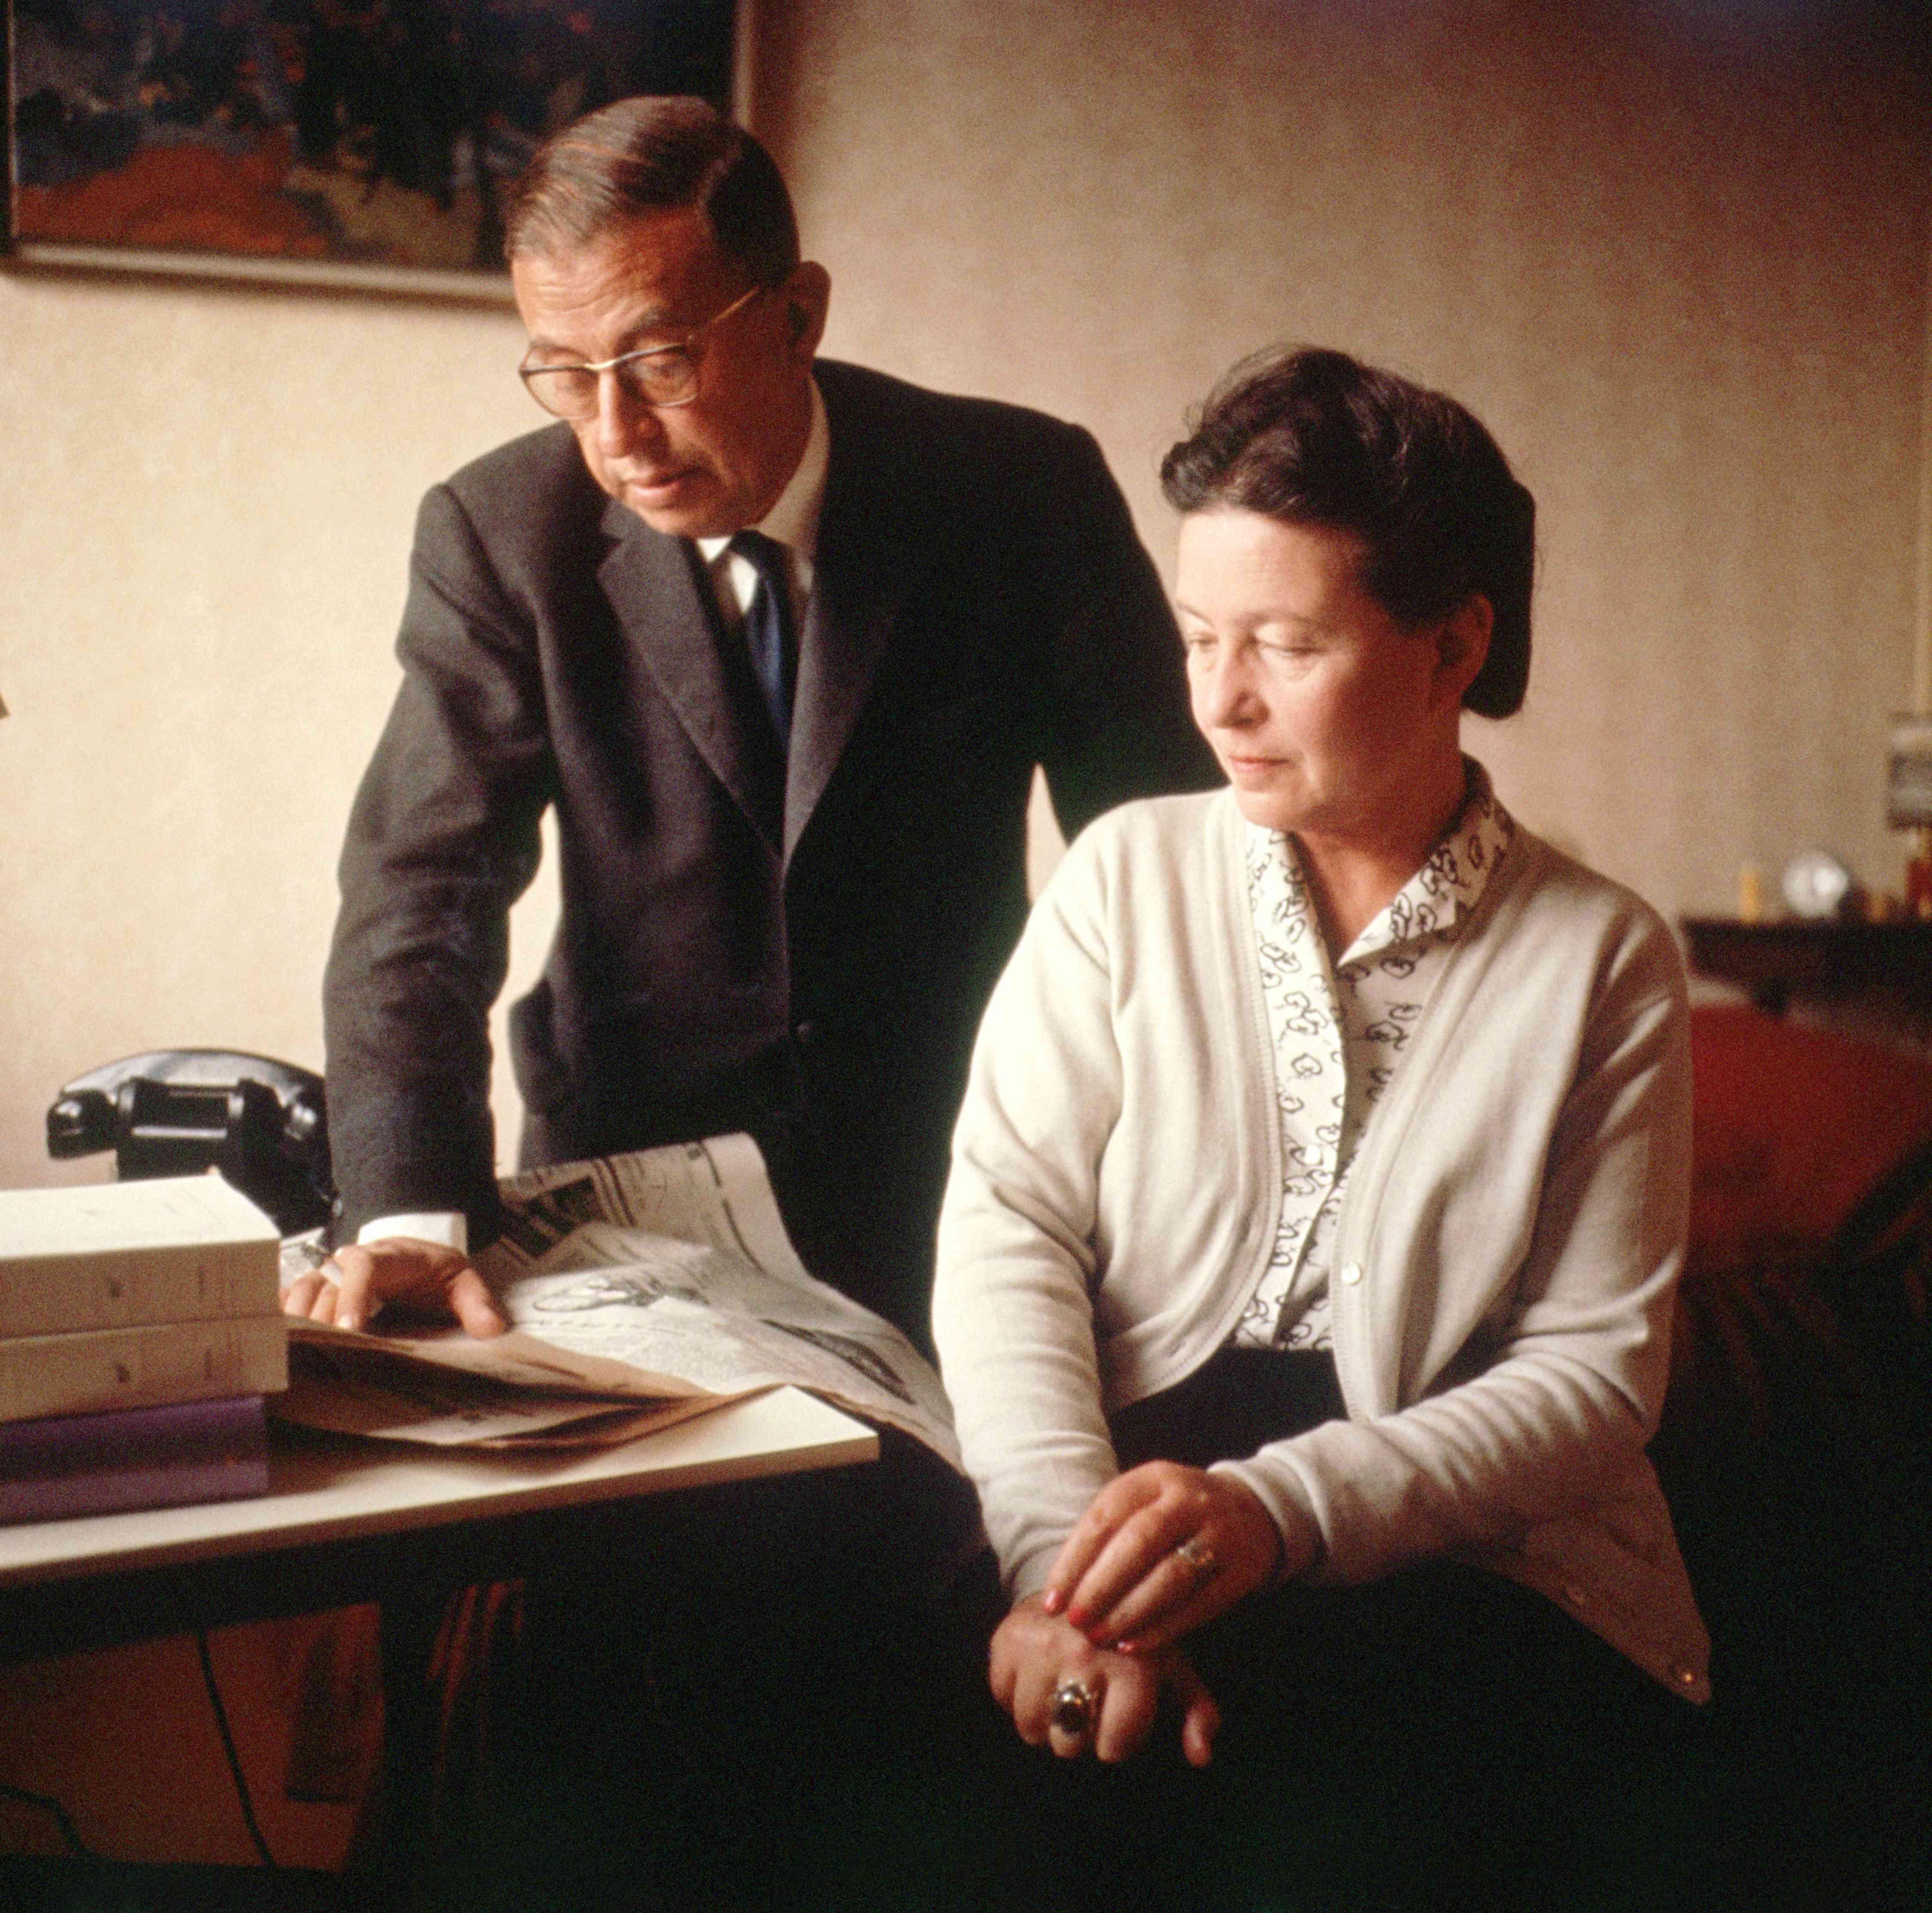 Simone de Beauvoir and Jean Paul Sarte